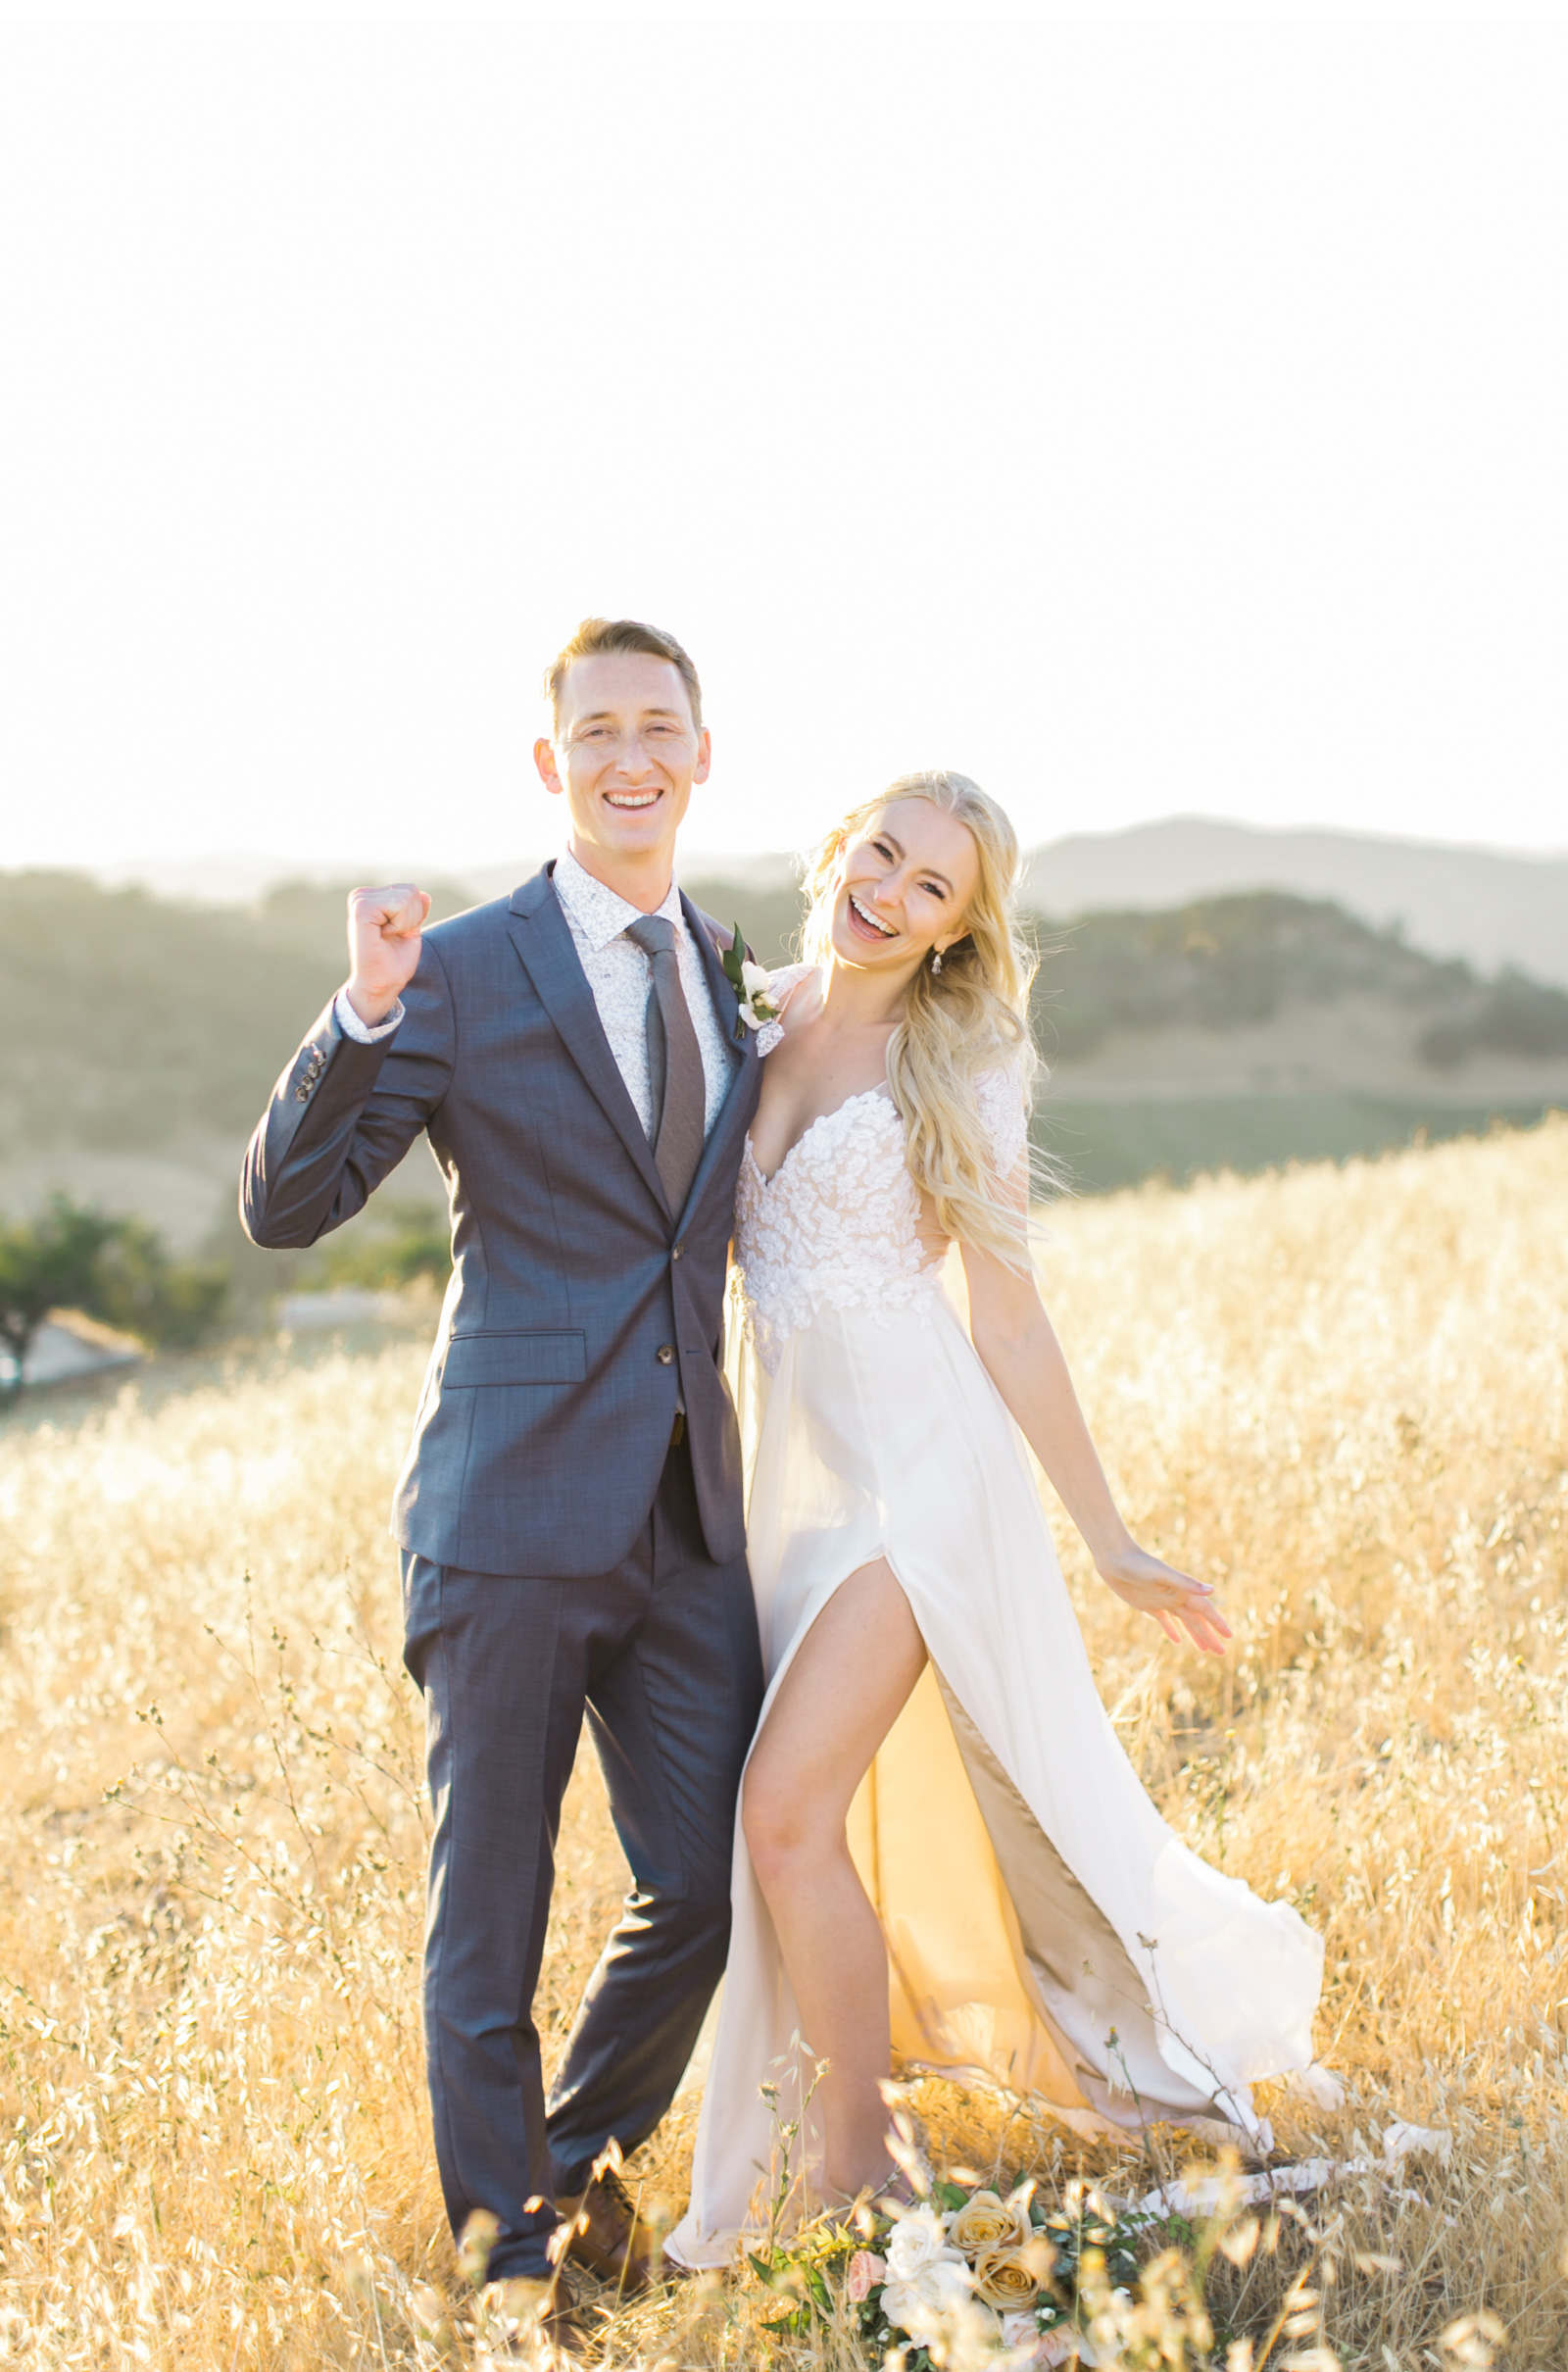 Natalie-Schutt-Photography's-Wedding-Style-Me-Pretty-Paso-Robles_02.jpg